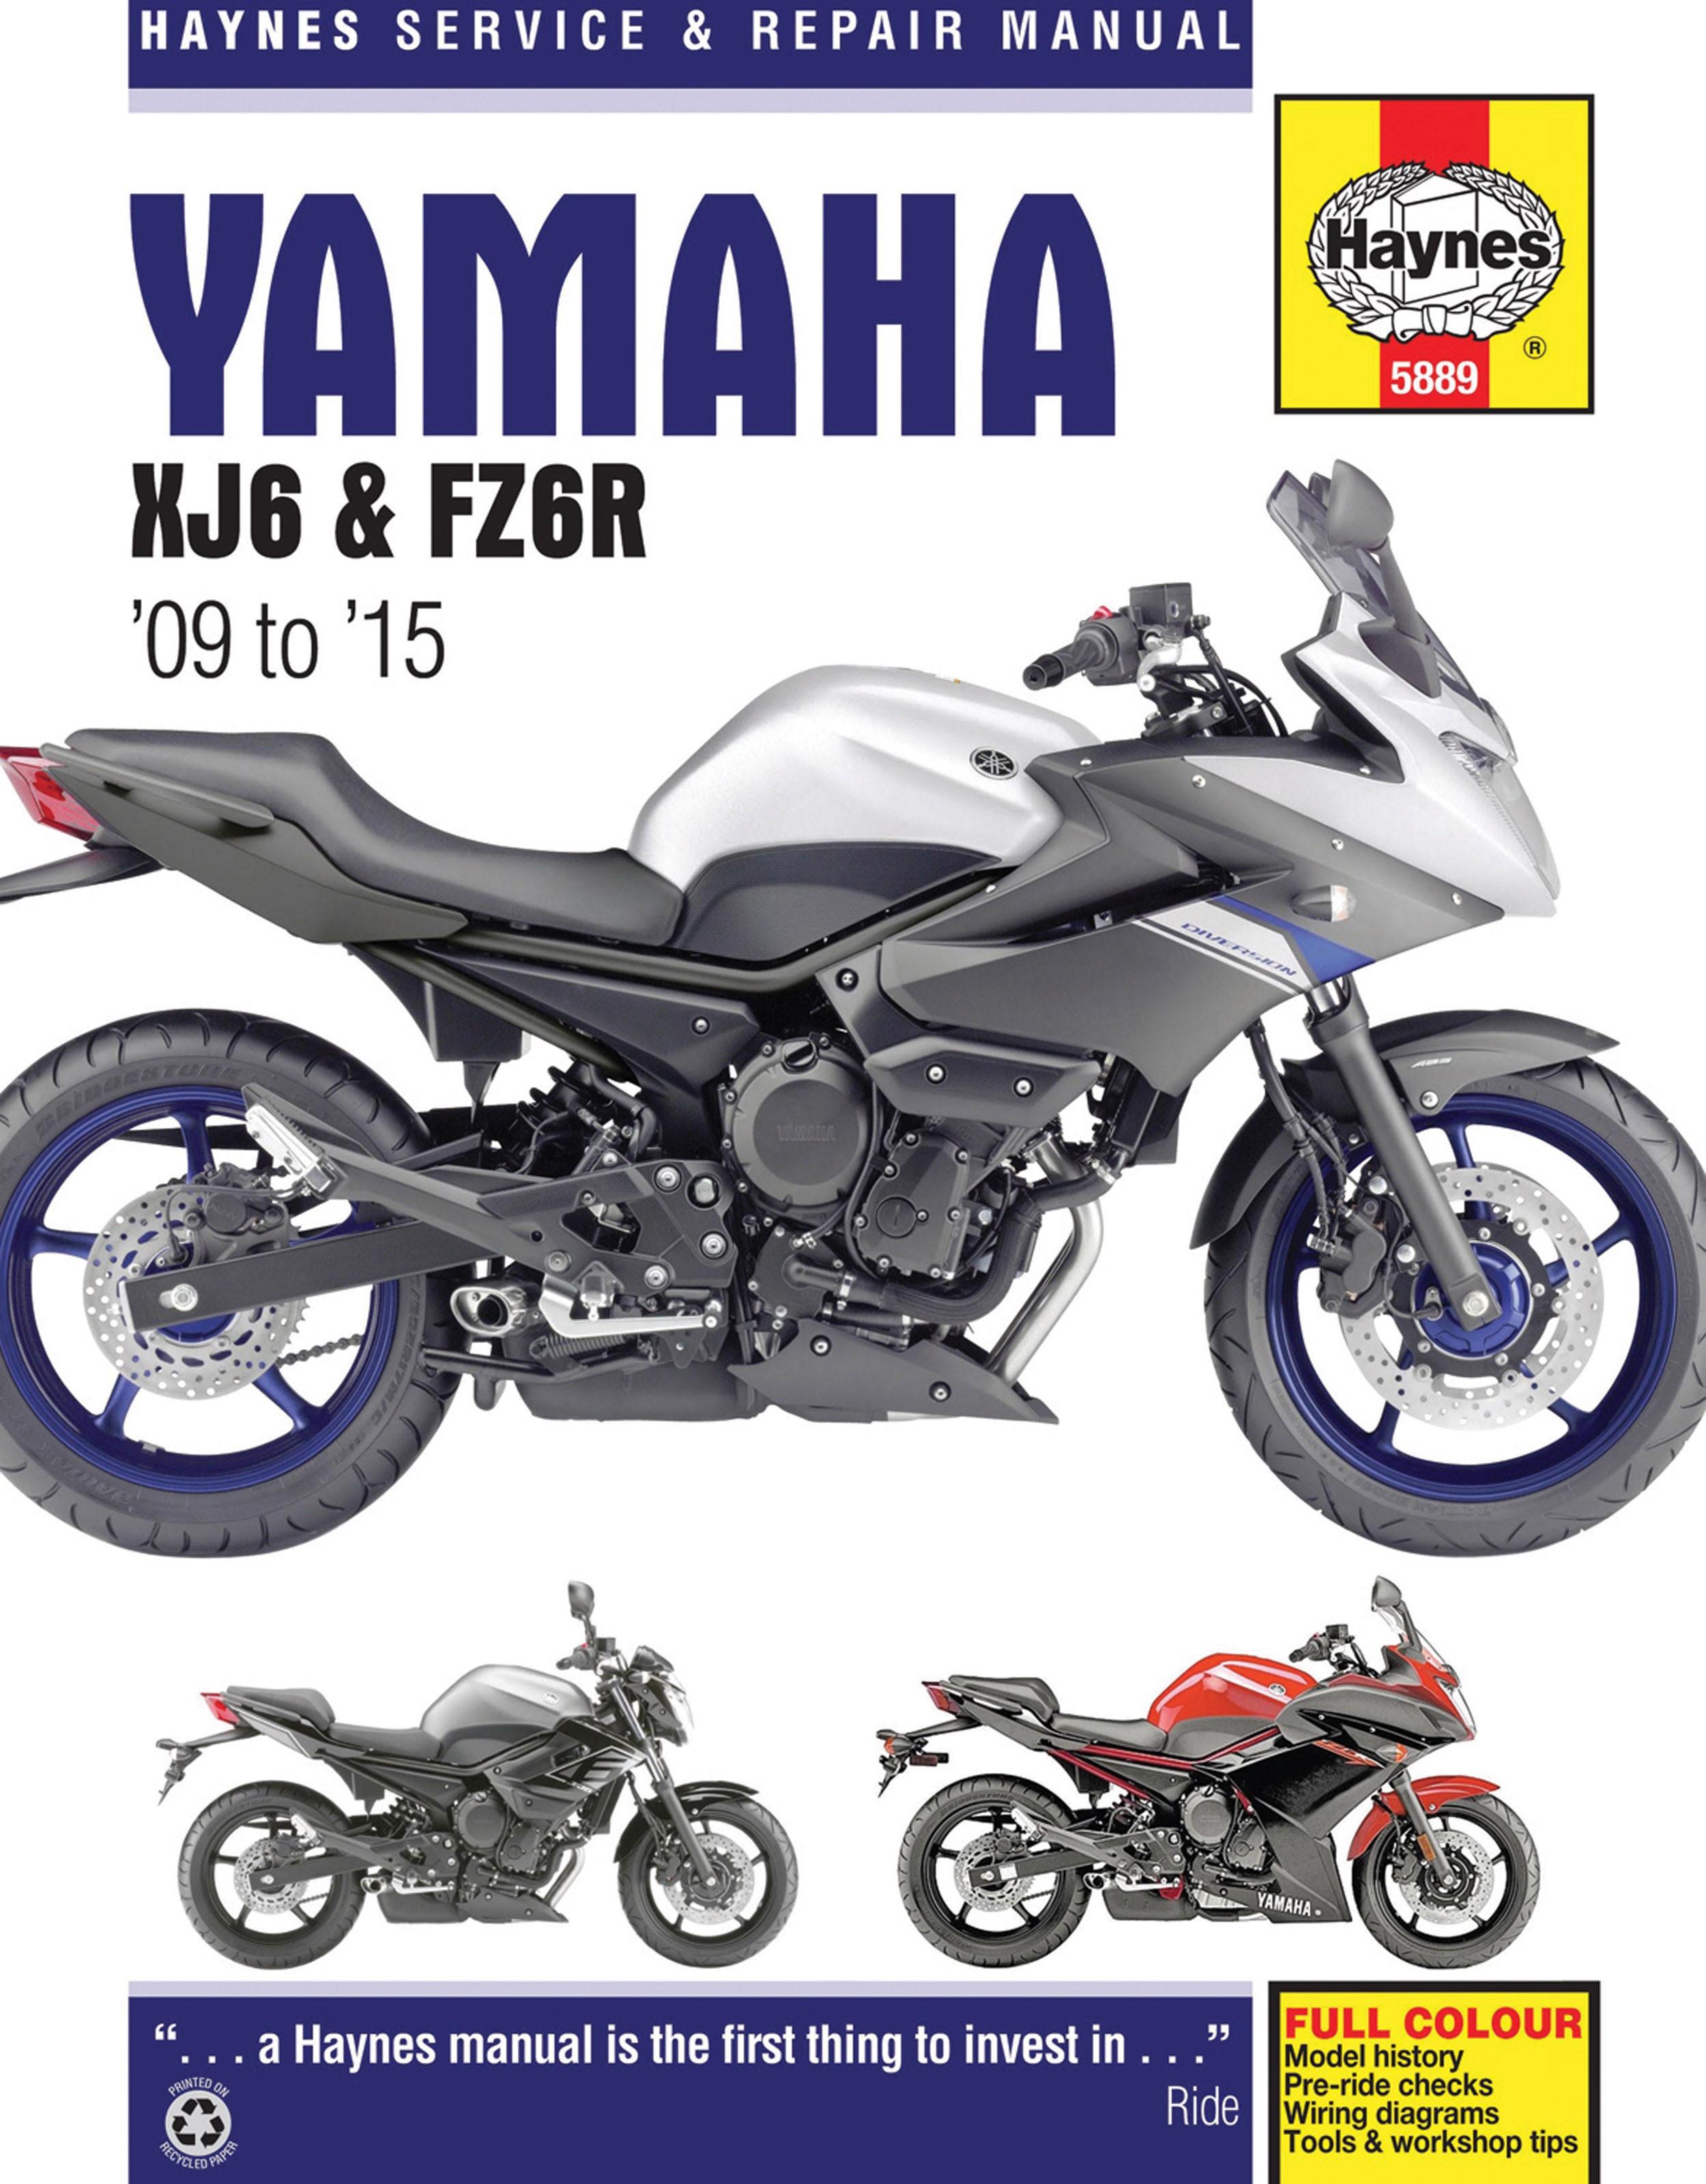 Haynes Repair Manual Yamaha Xj6 Fz6r Wiring Diagrams